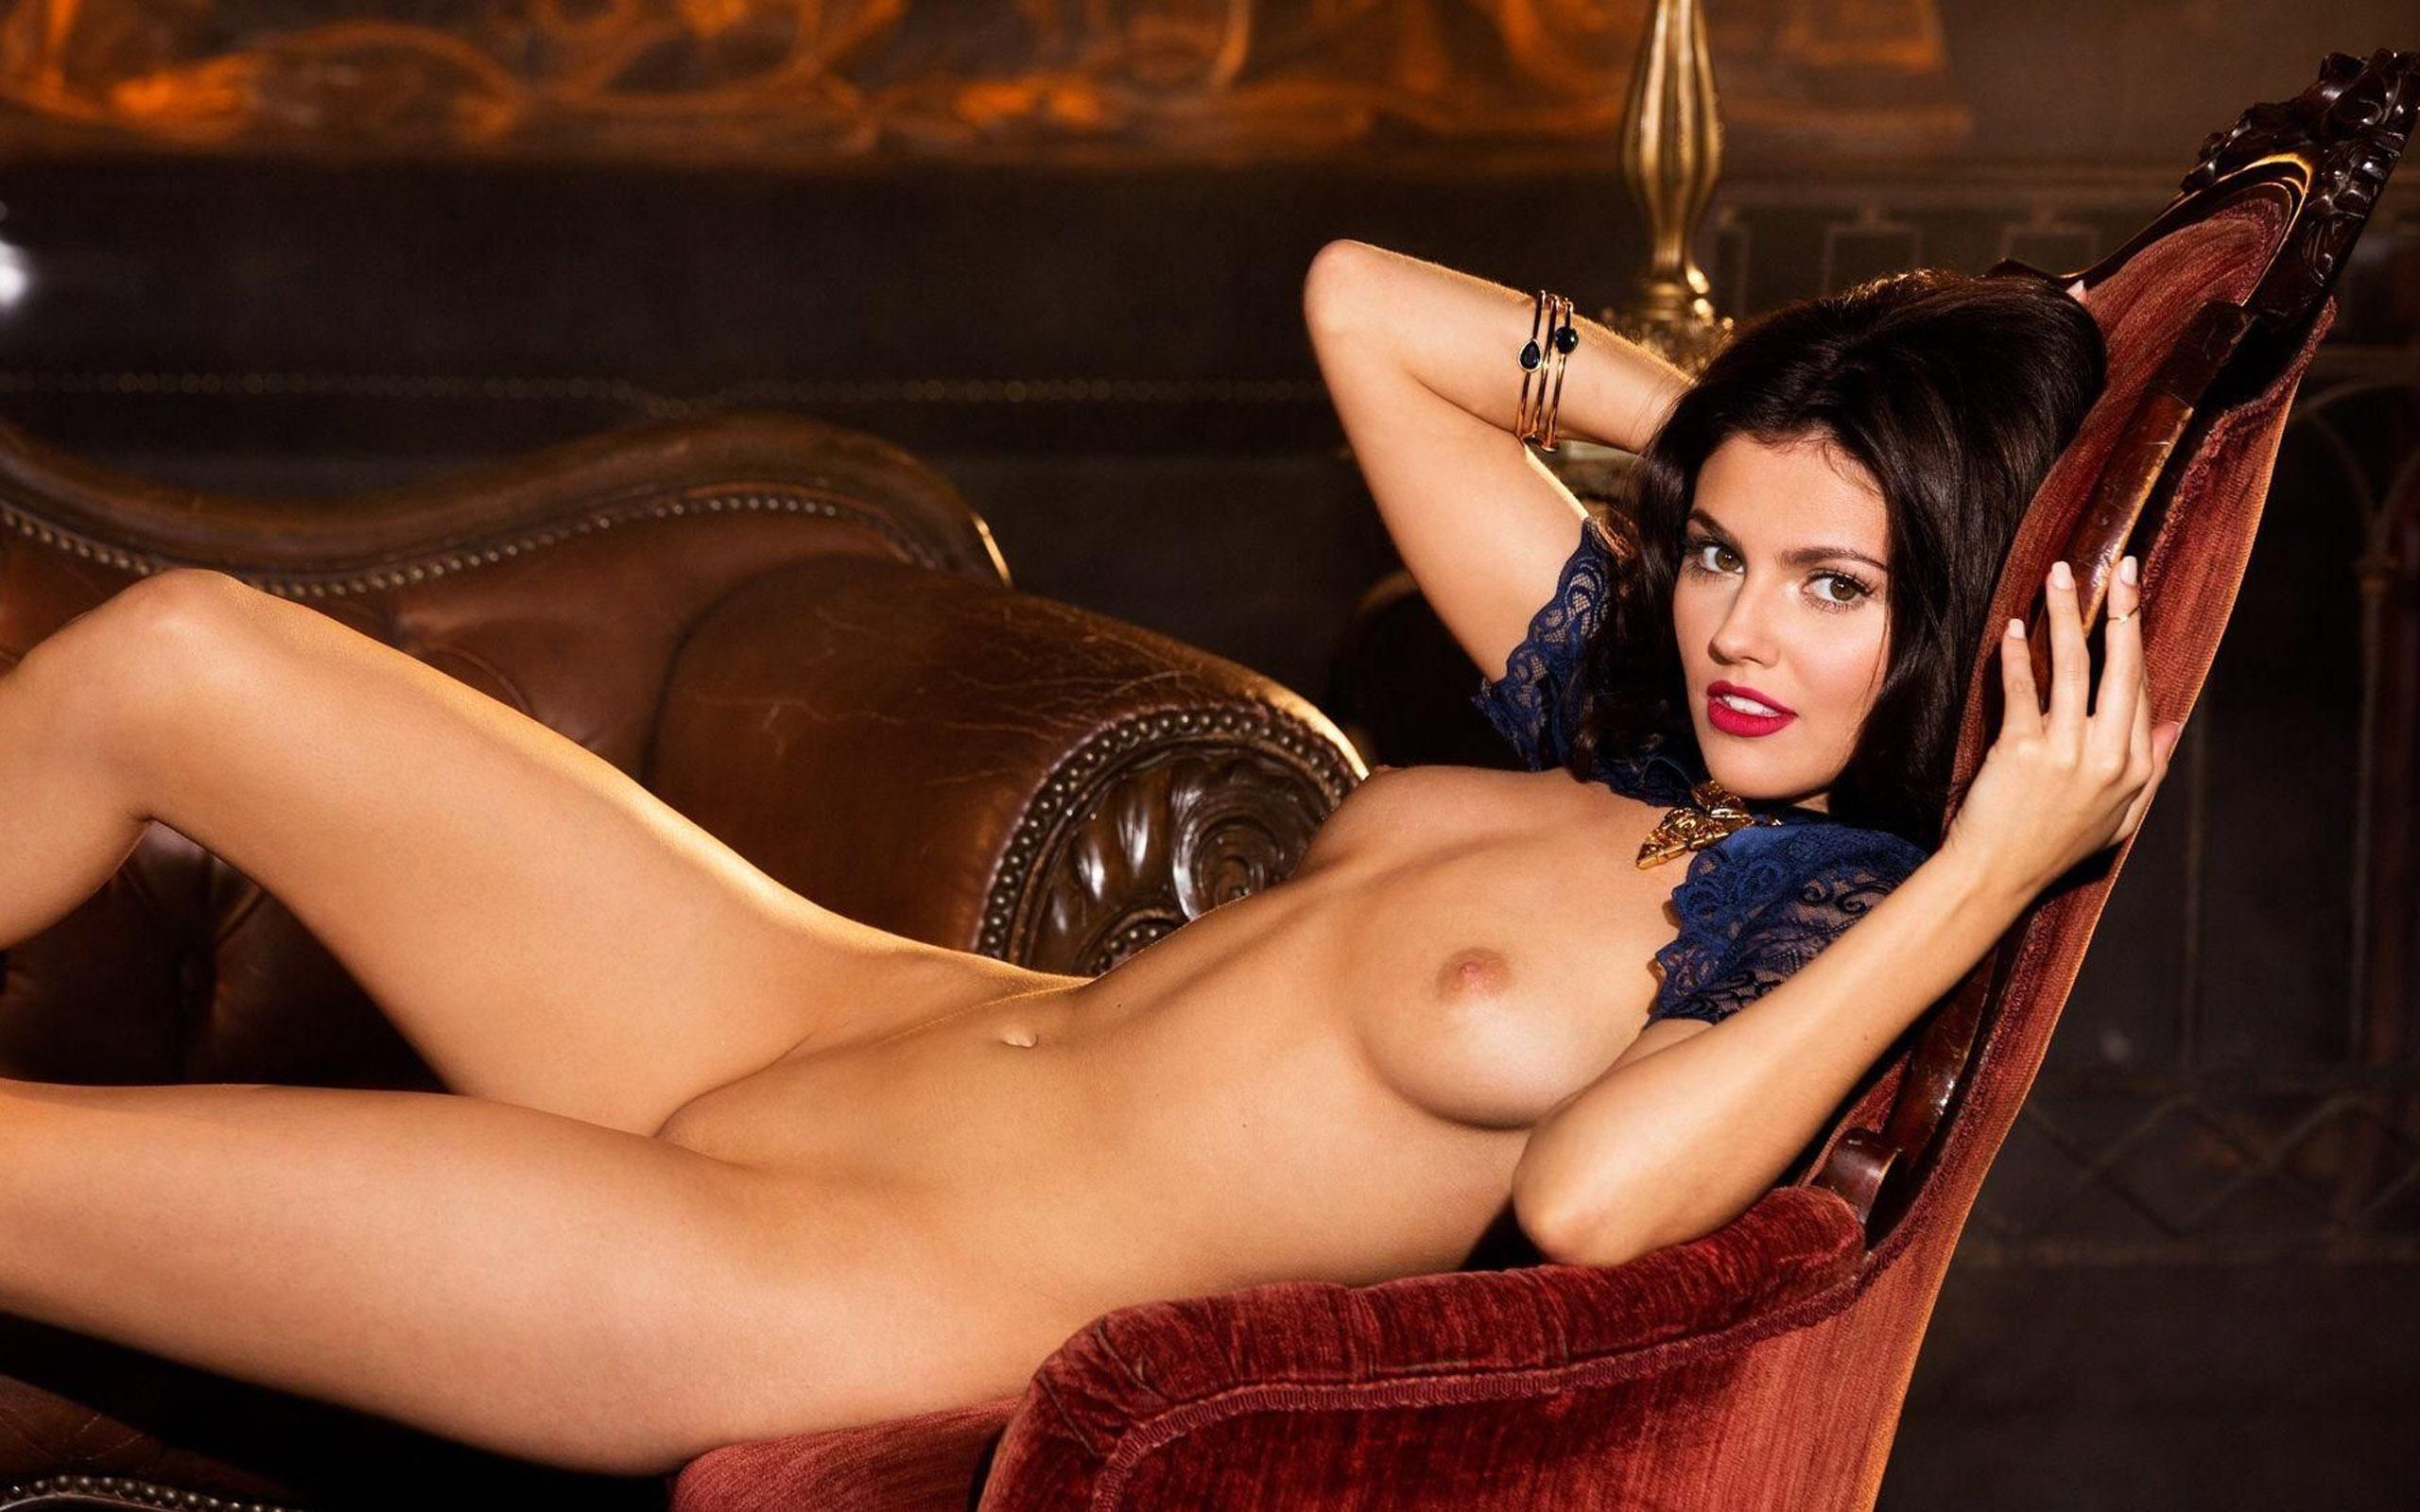 Playboy Magazine Girls Nude